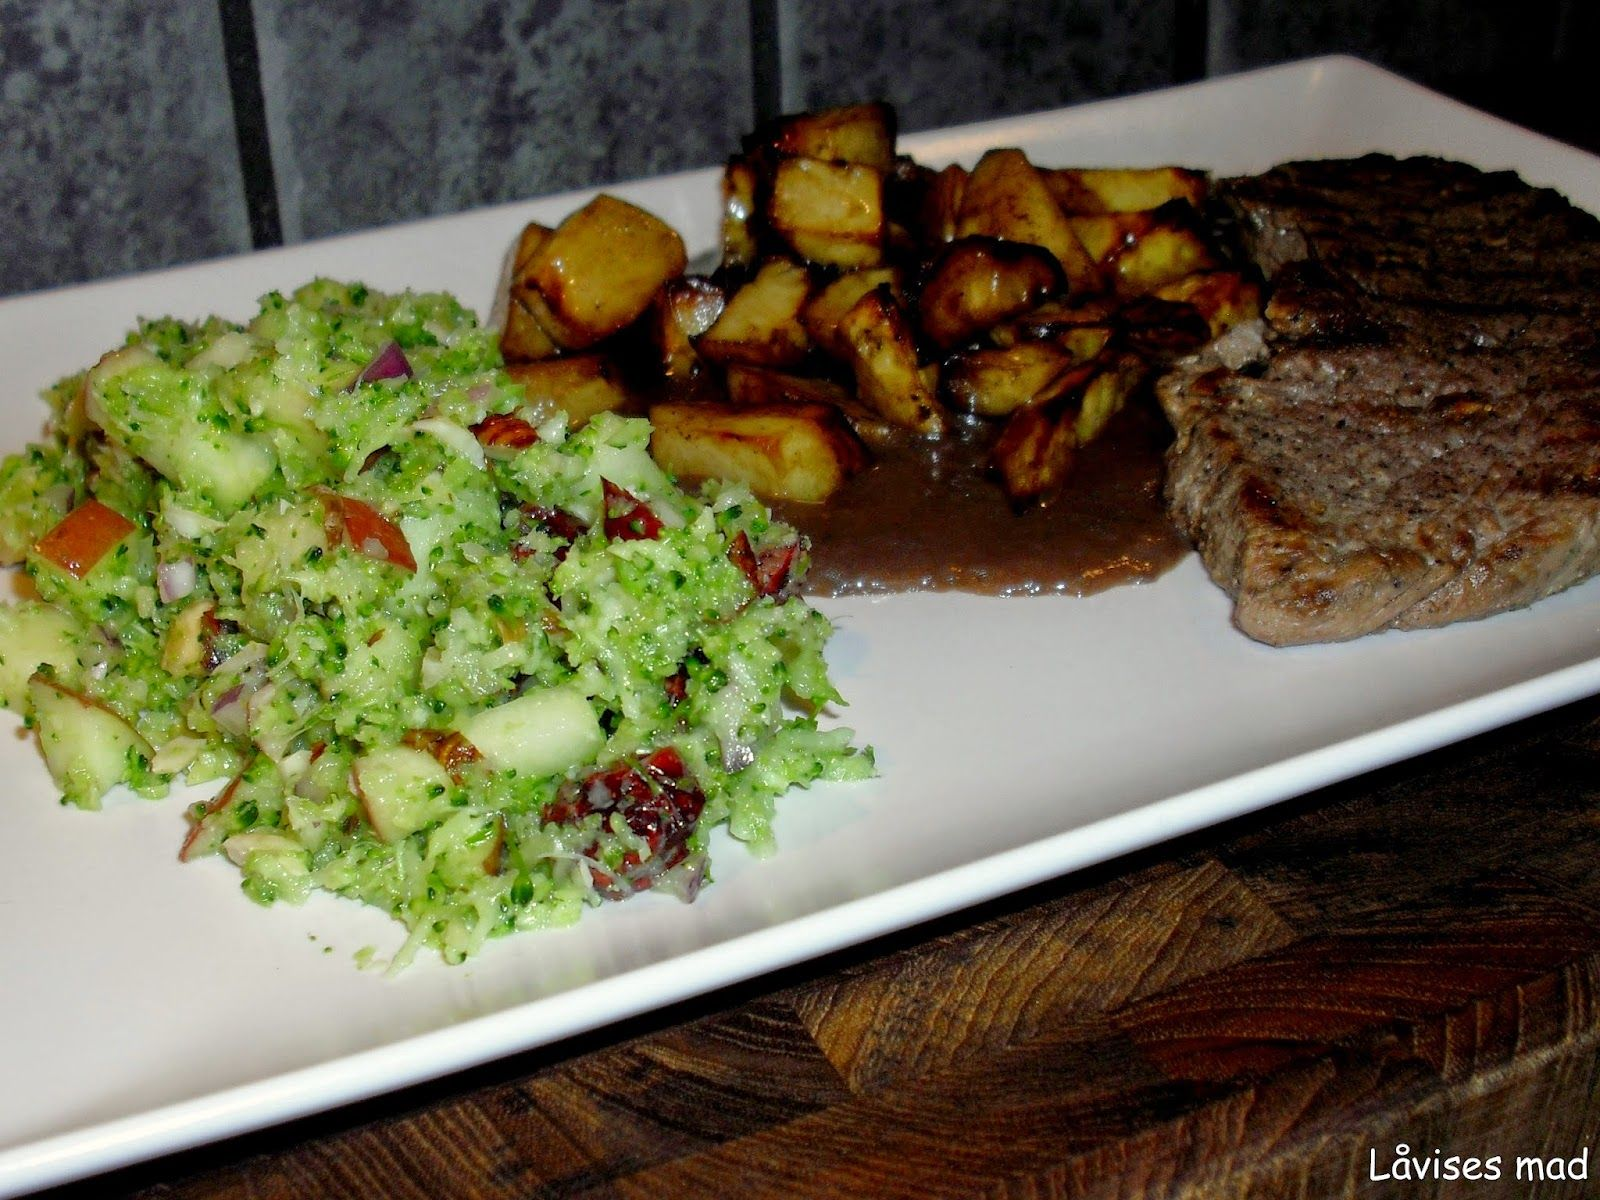 Låvises mad: Balsamico kartofler